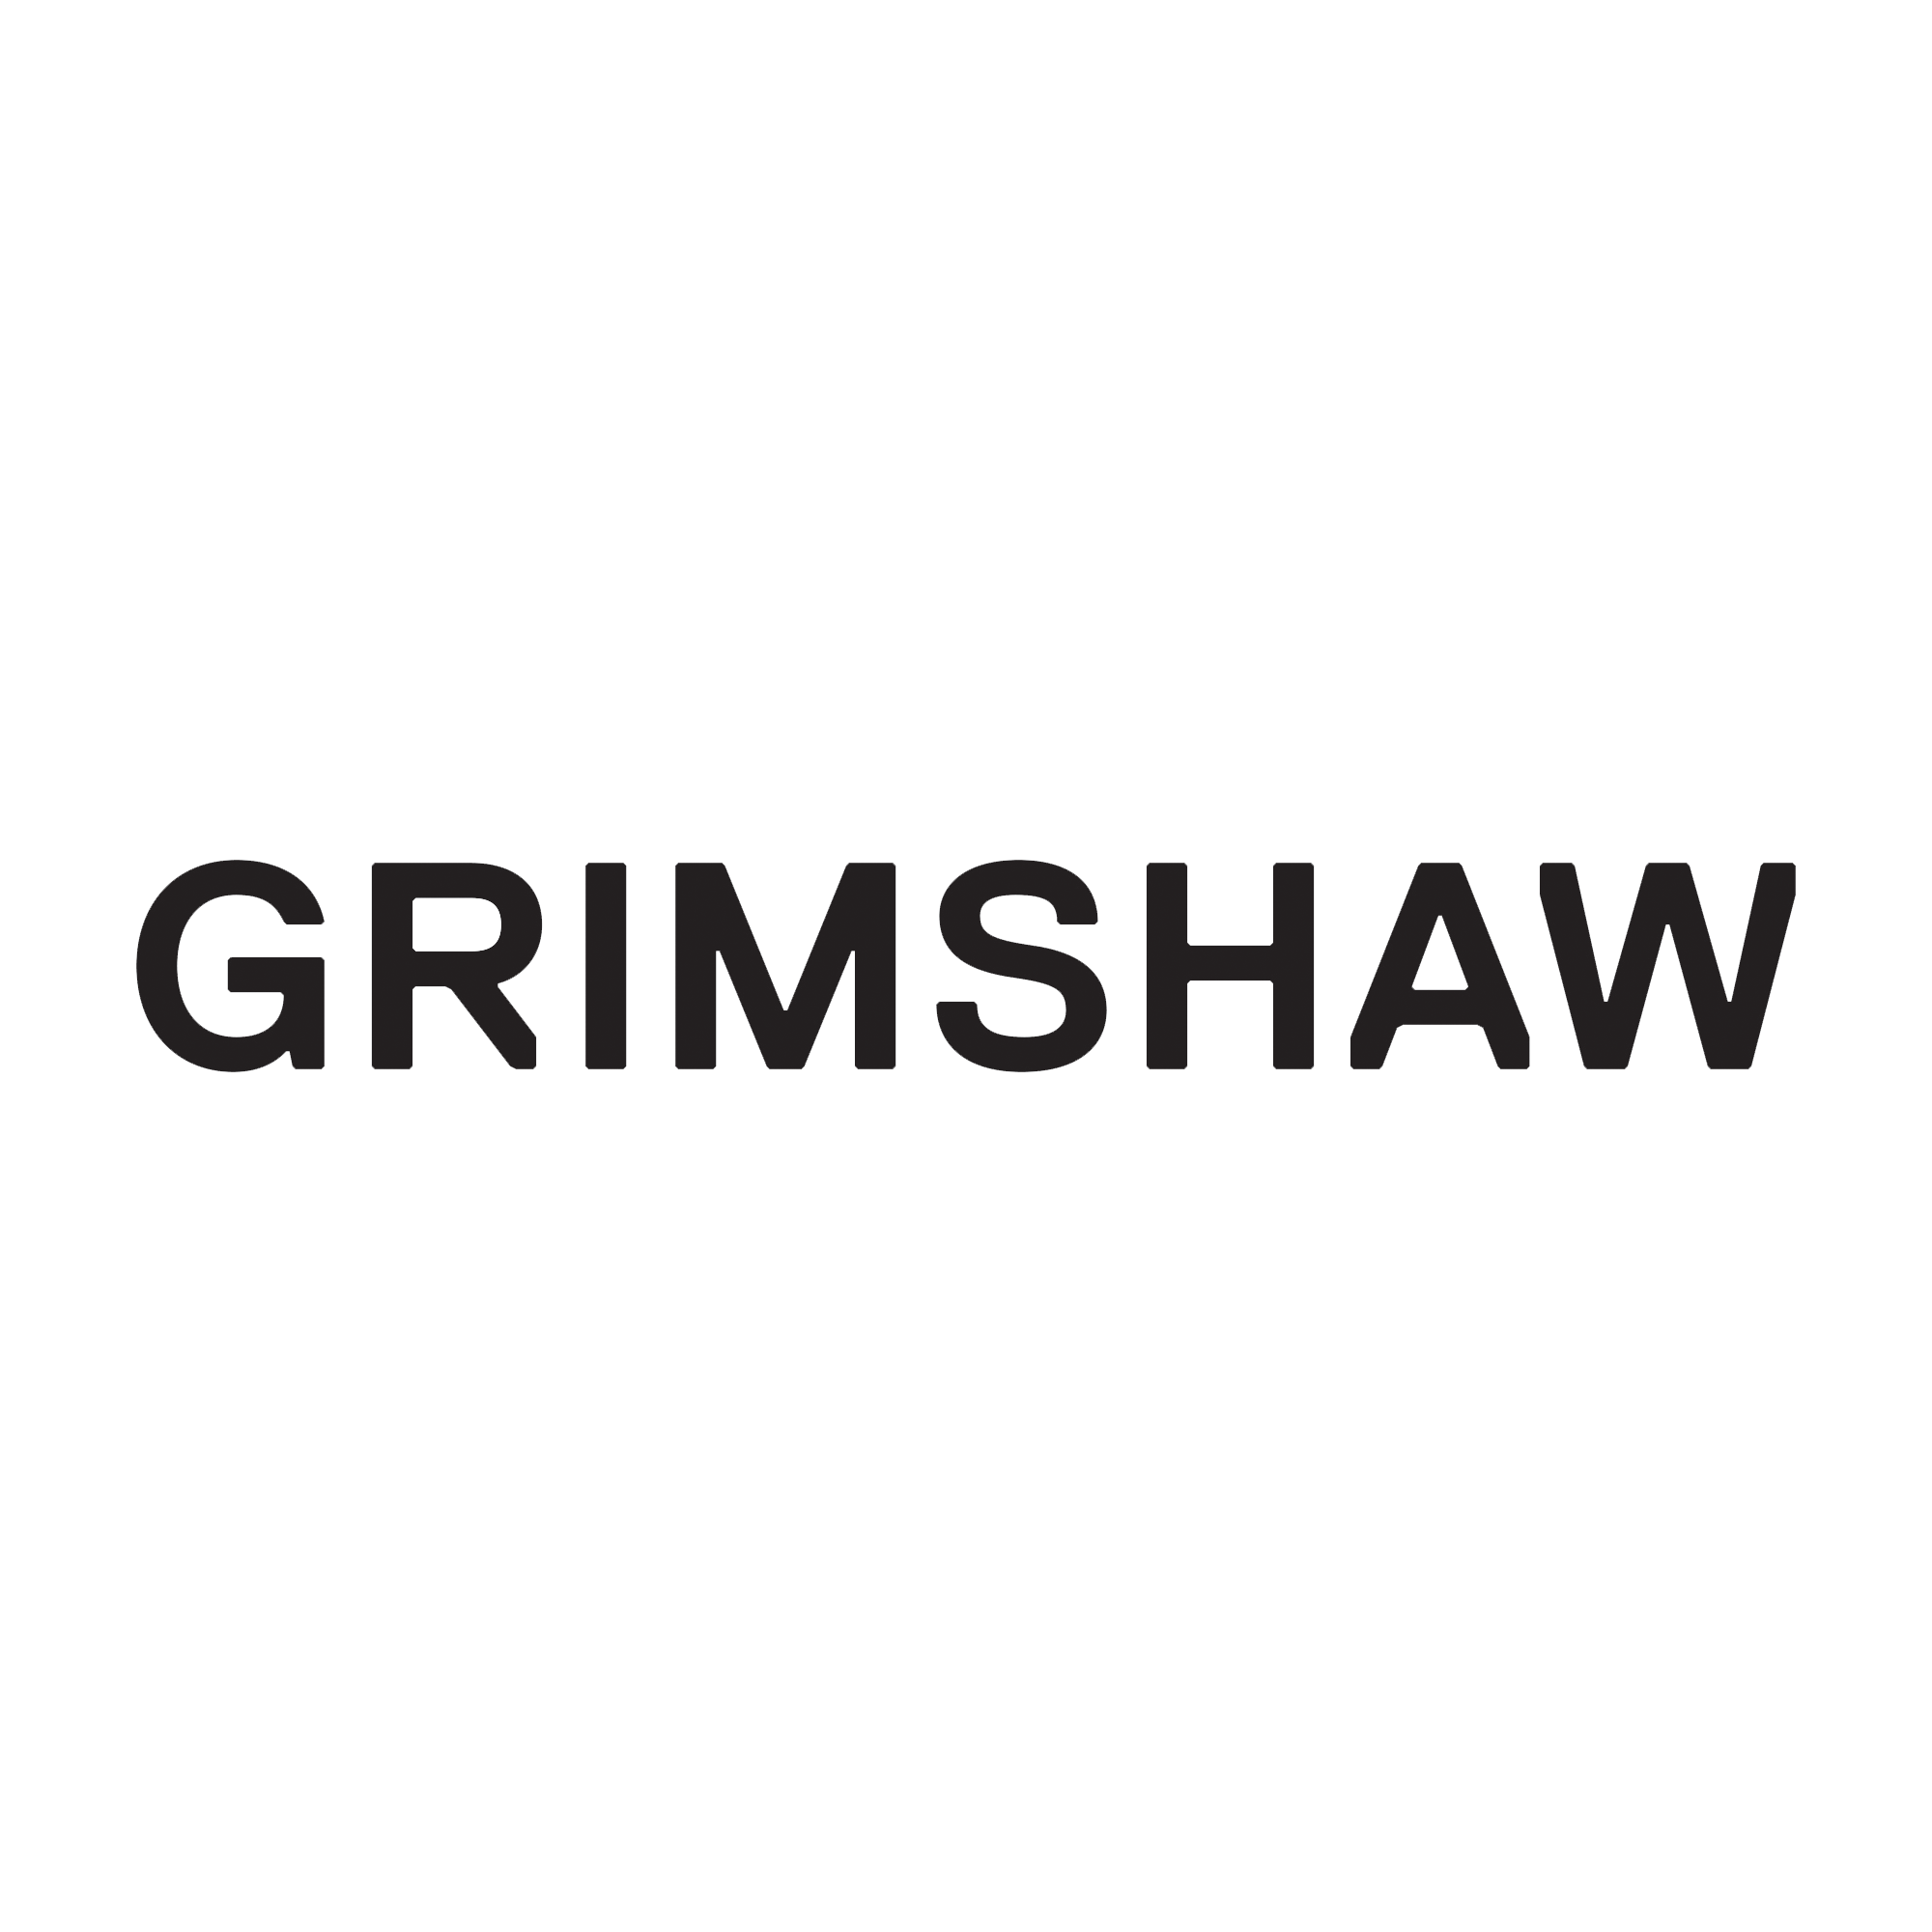 Grimshaw.png